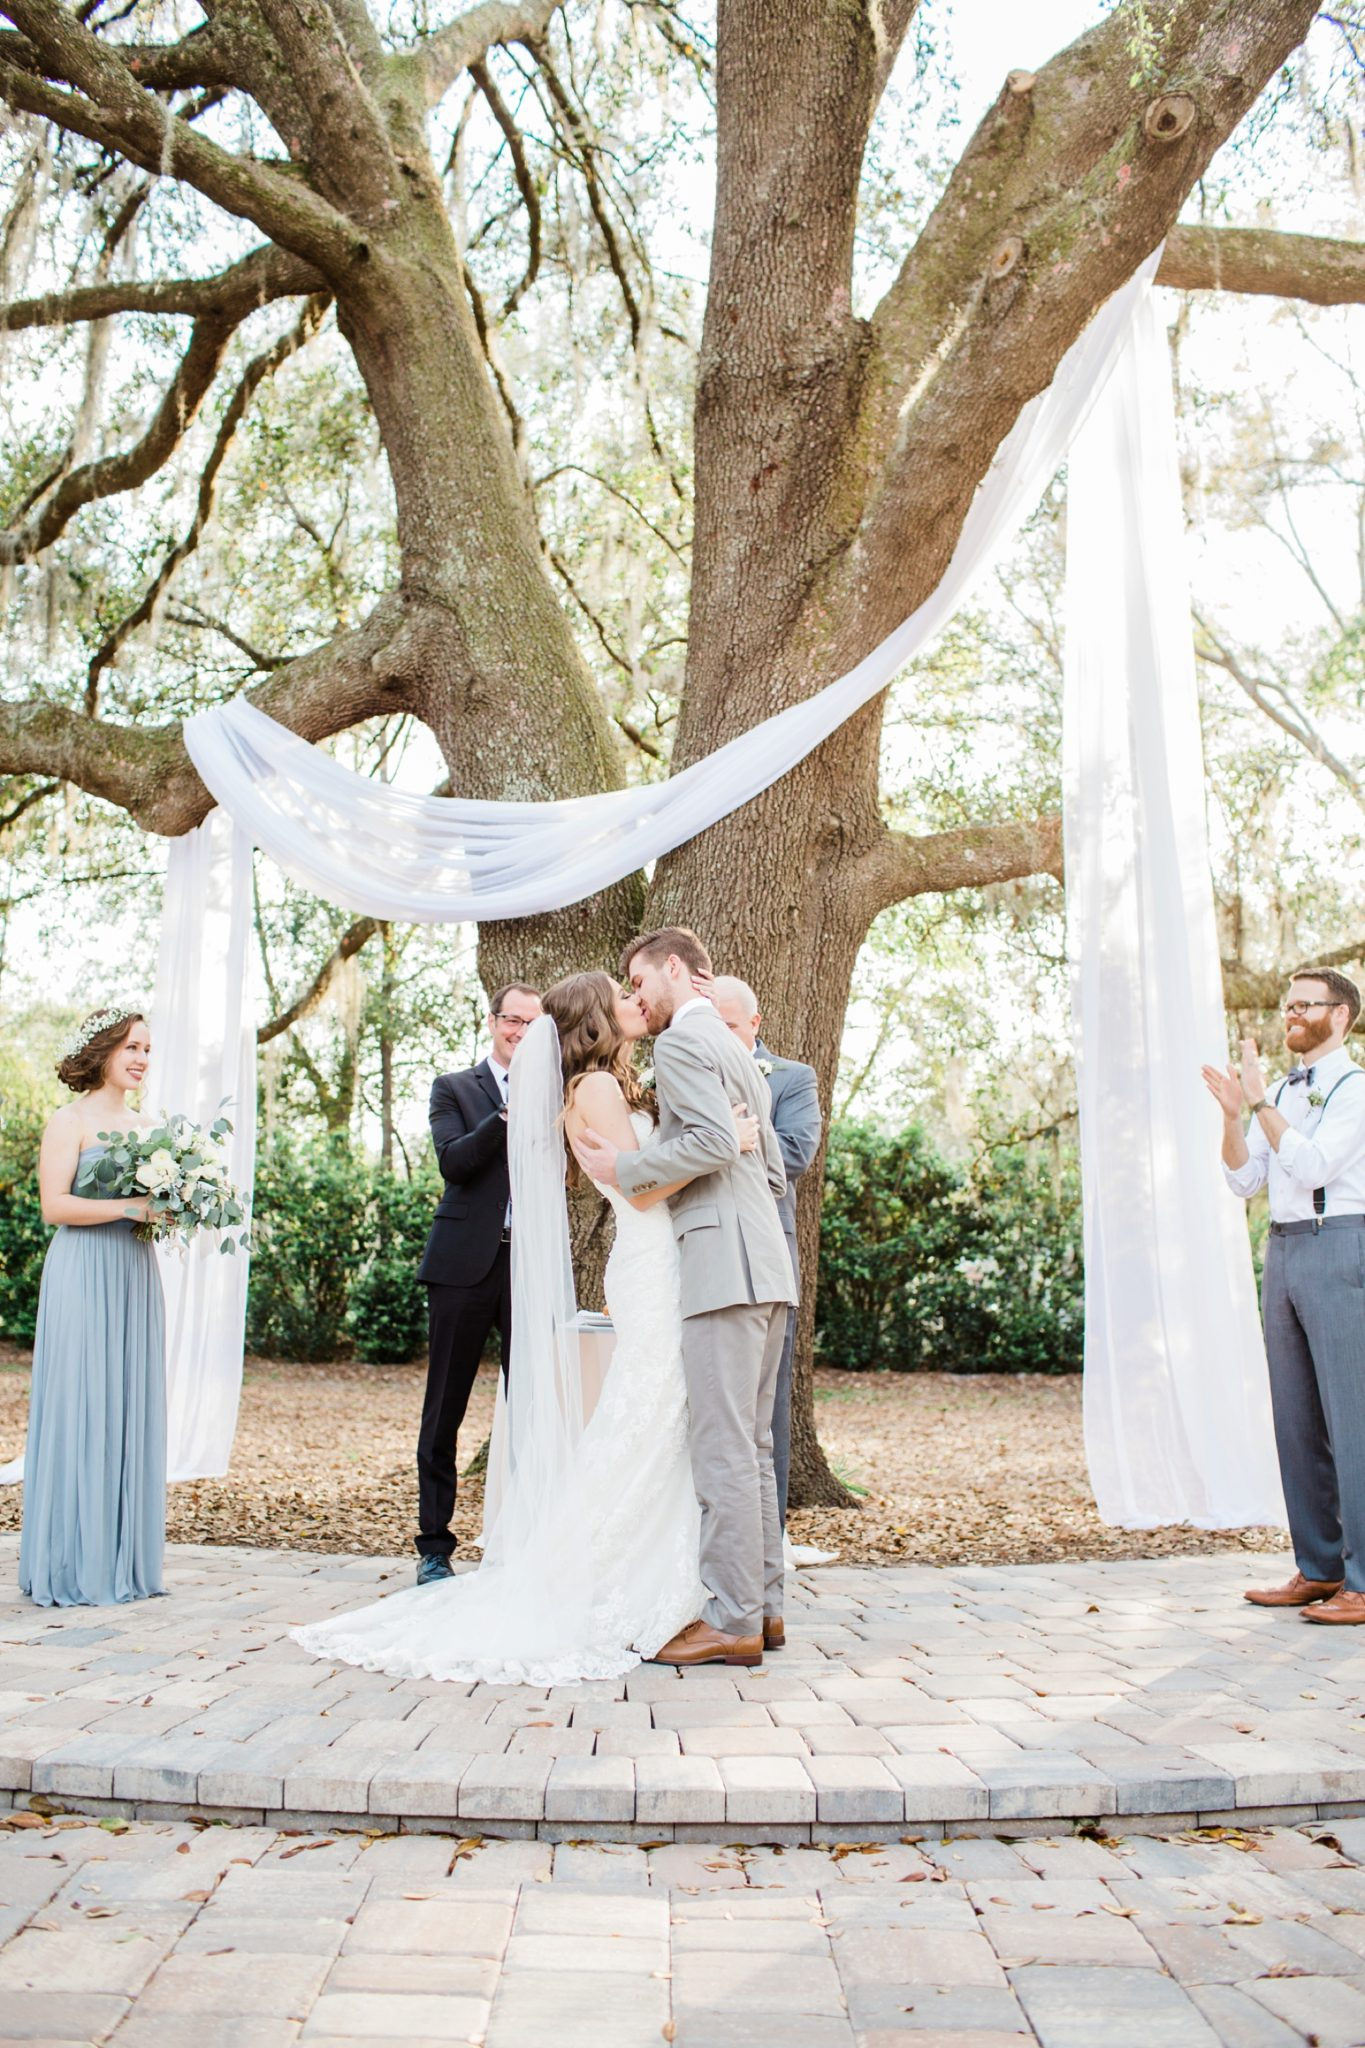 Rachel Amp Taylor Bowing Oaks Plantationwedding Natalie